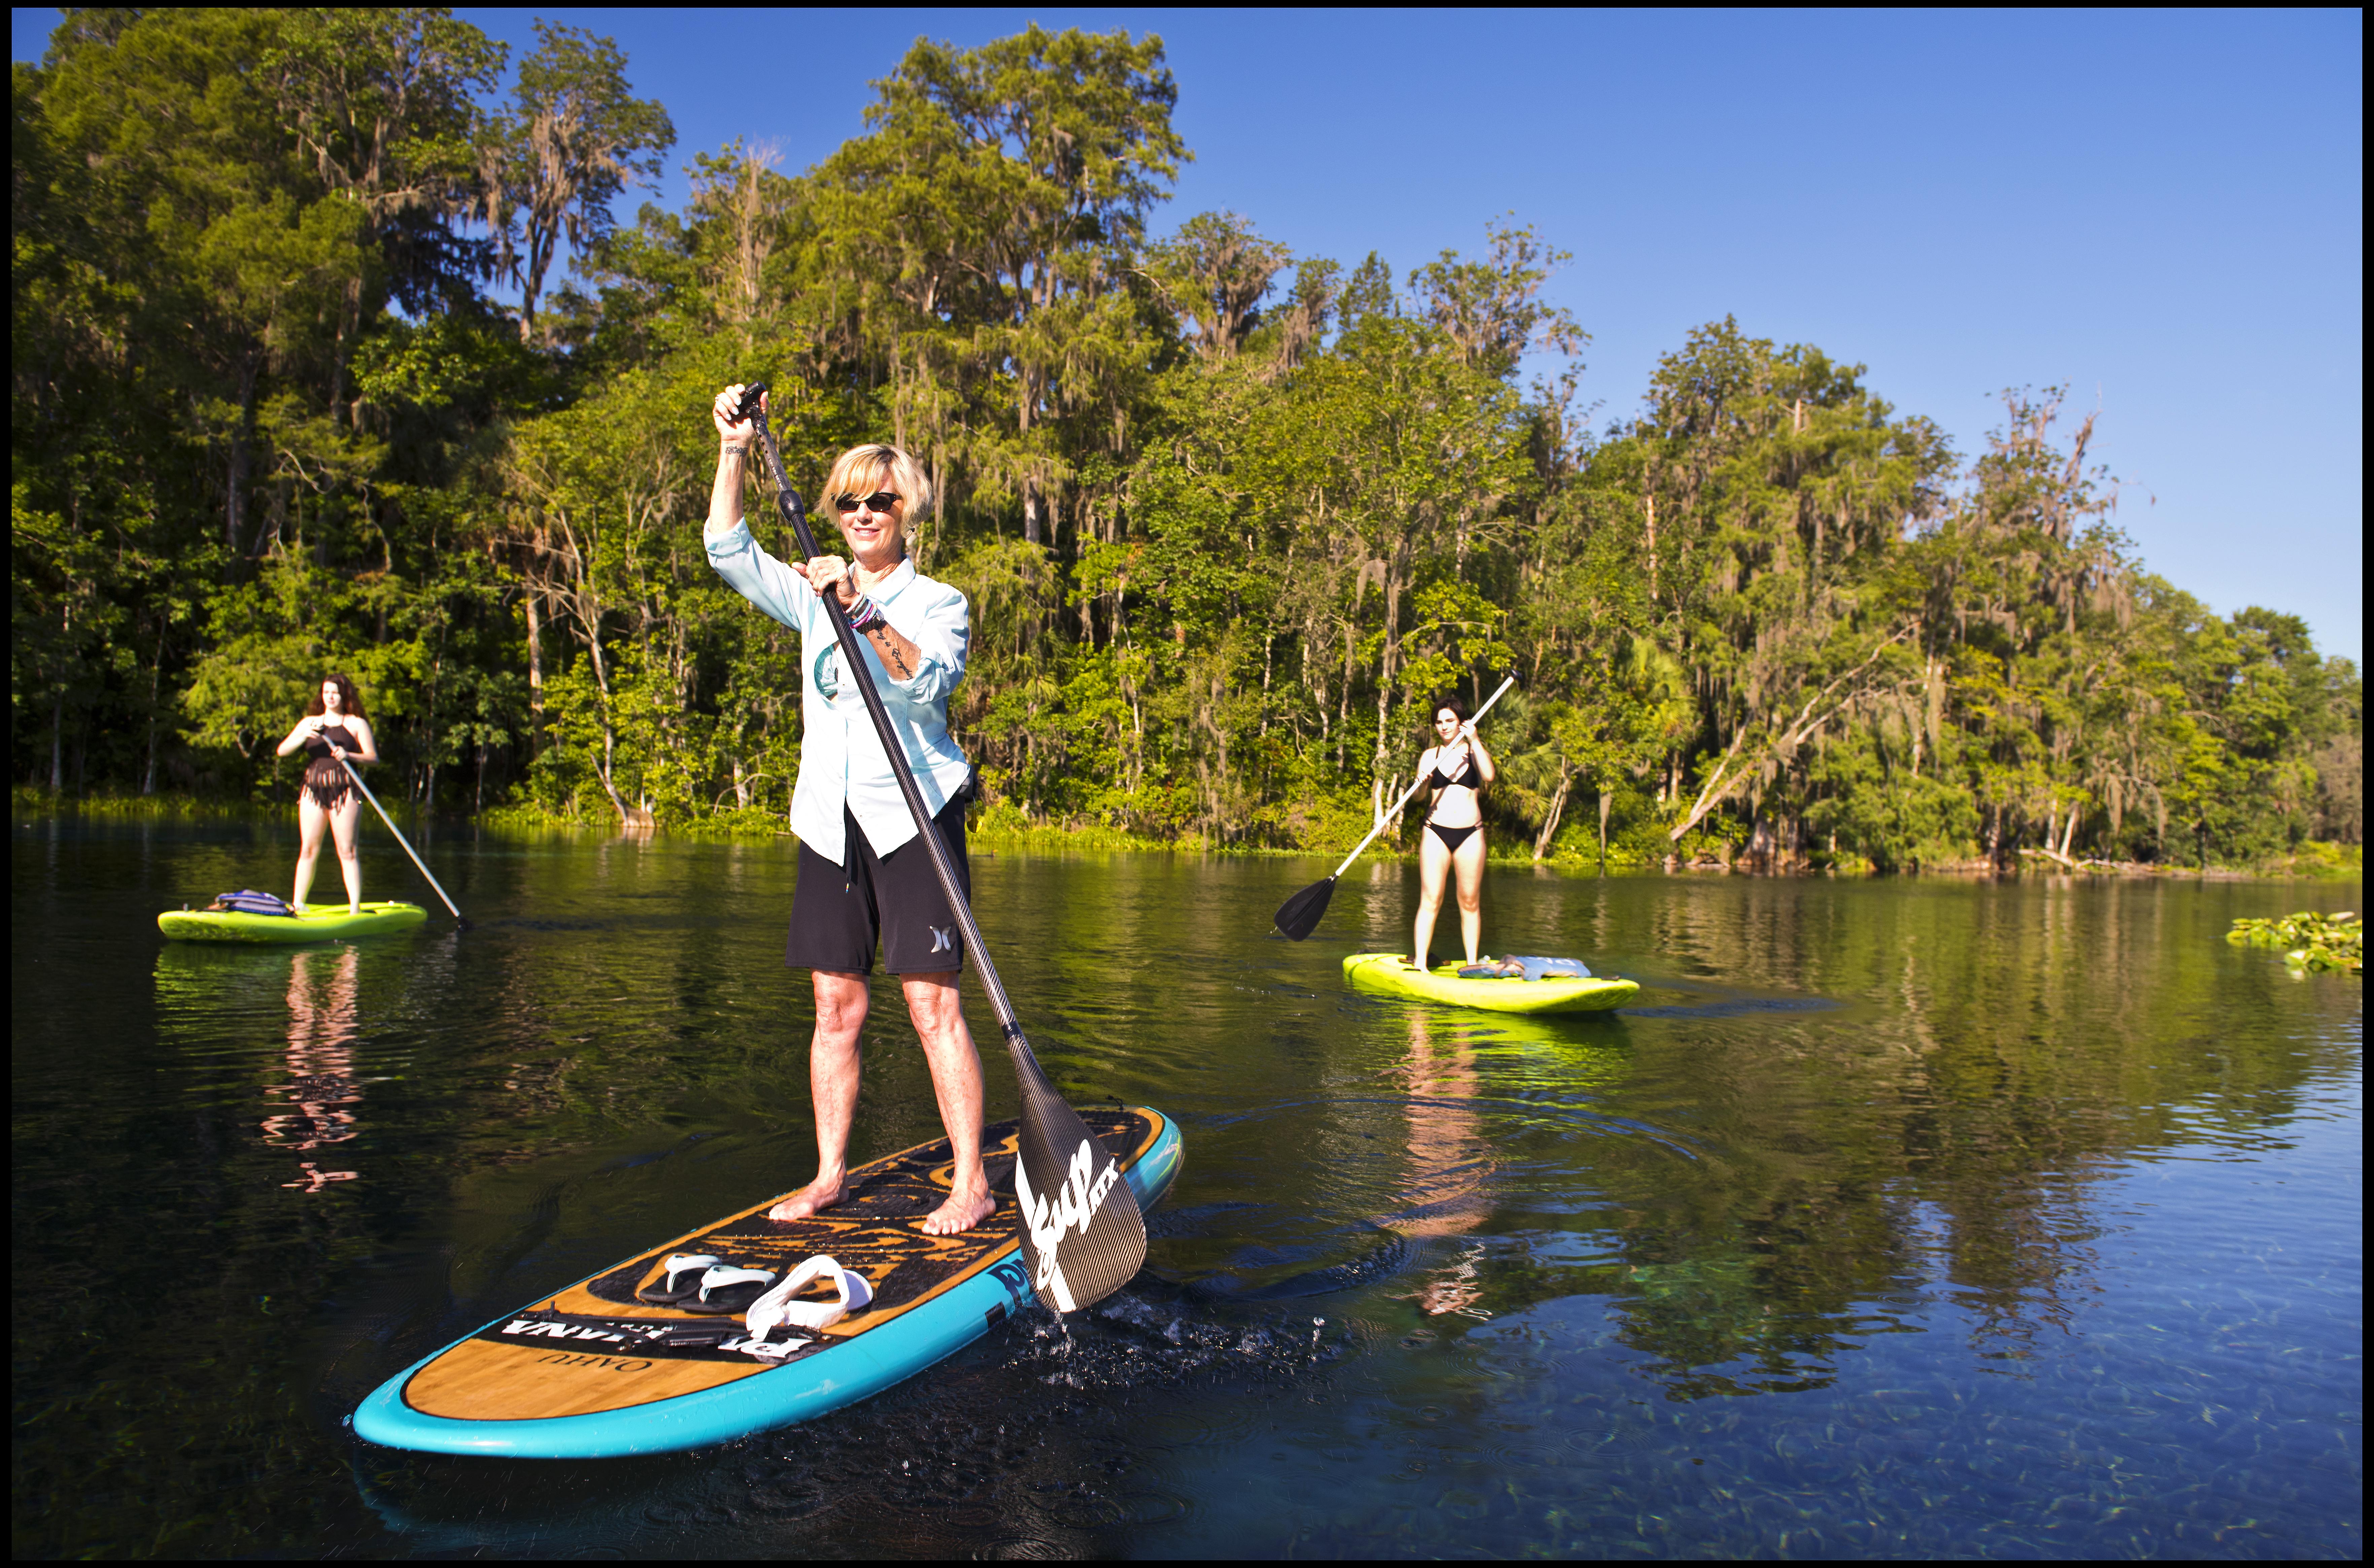 Silver Springs Paddleboard Rental